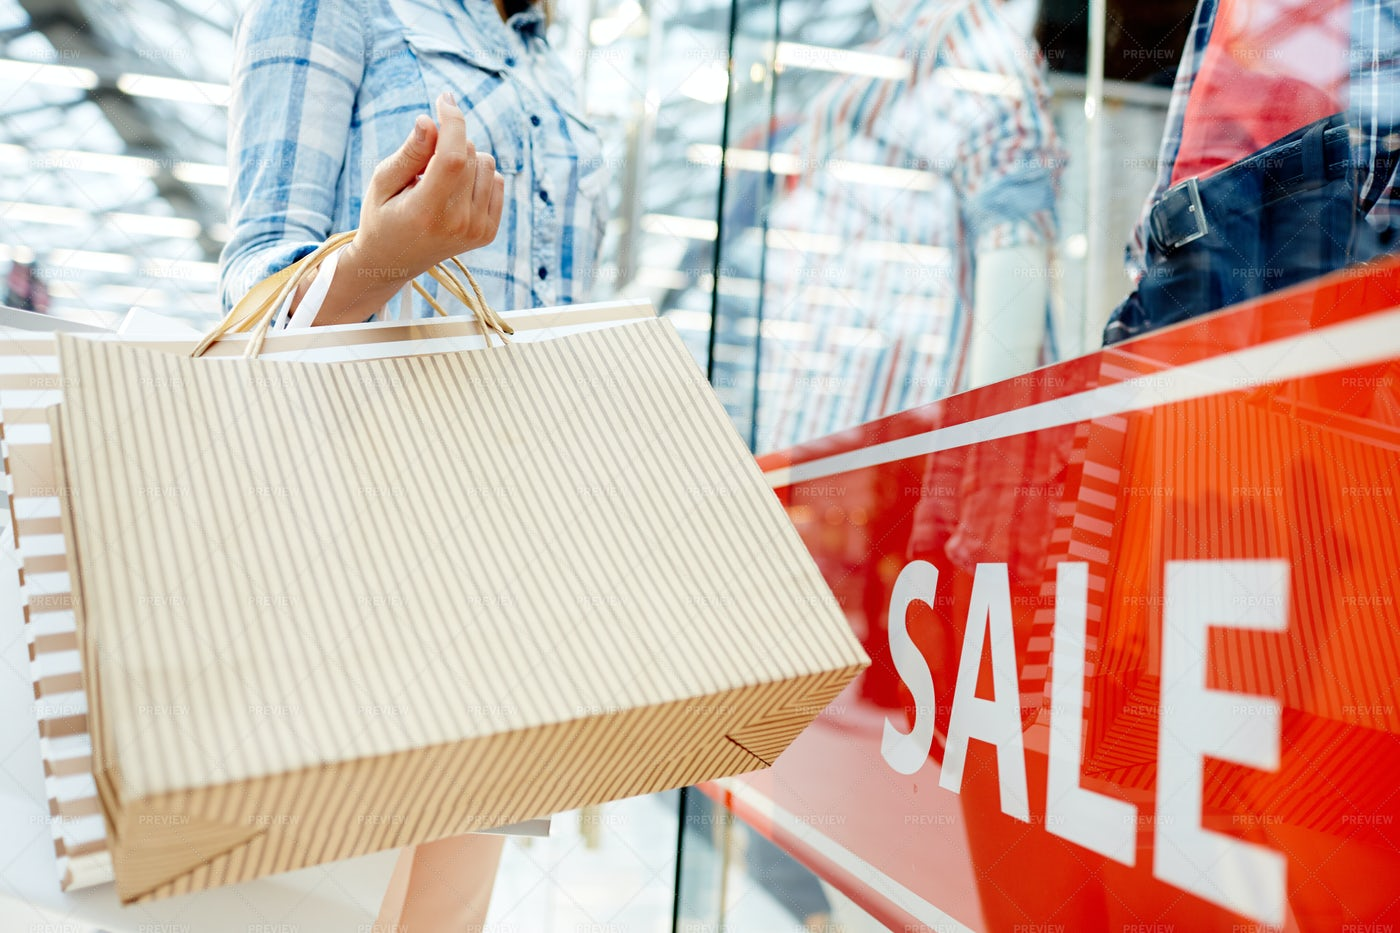 Shopper By Window Display: Stock Photos